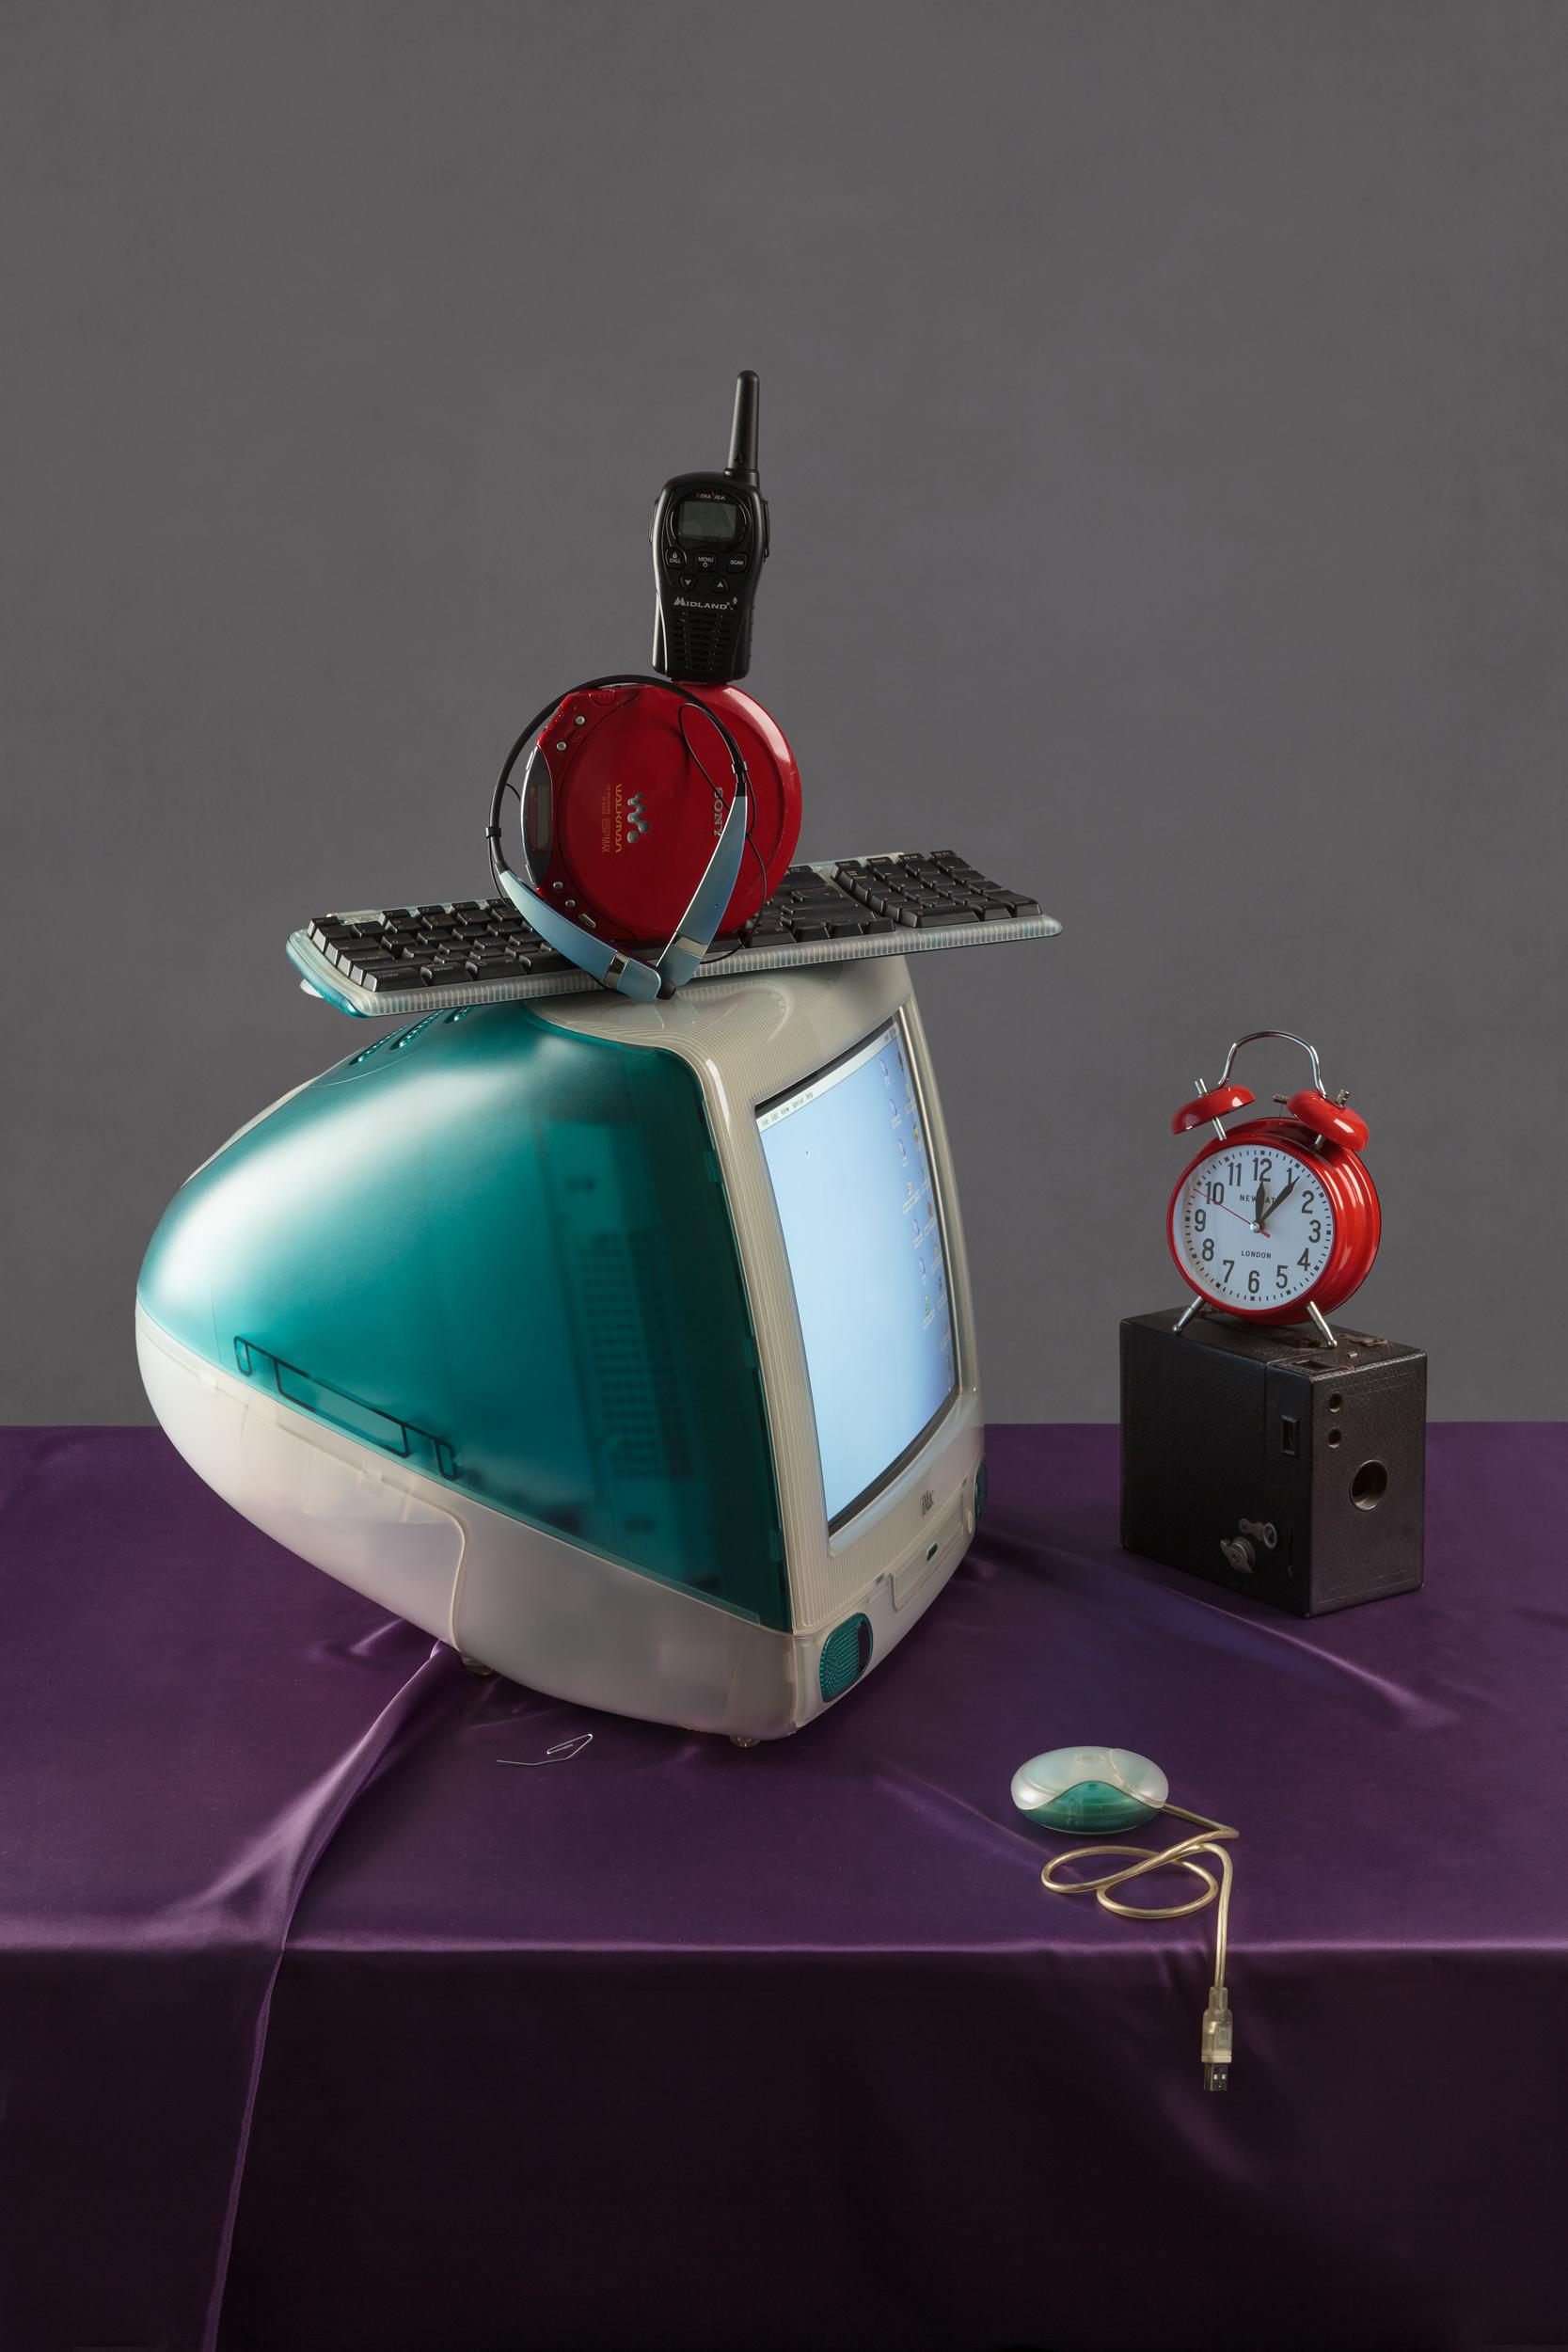 Tech Vanitas: Blue iMac